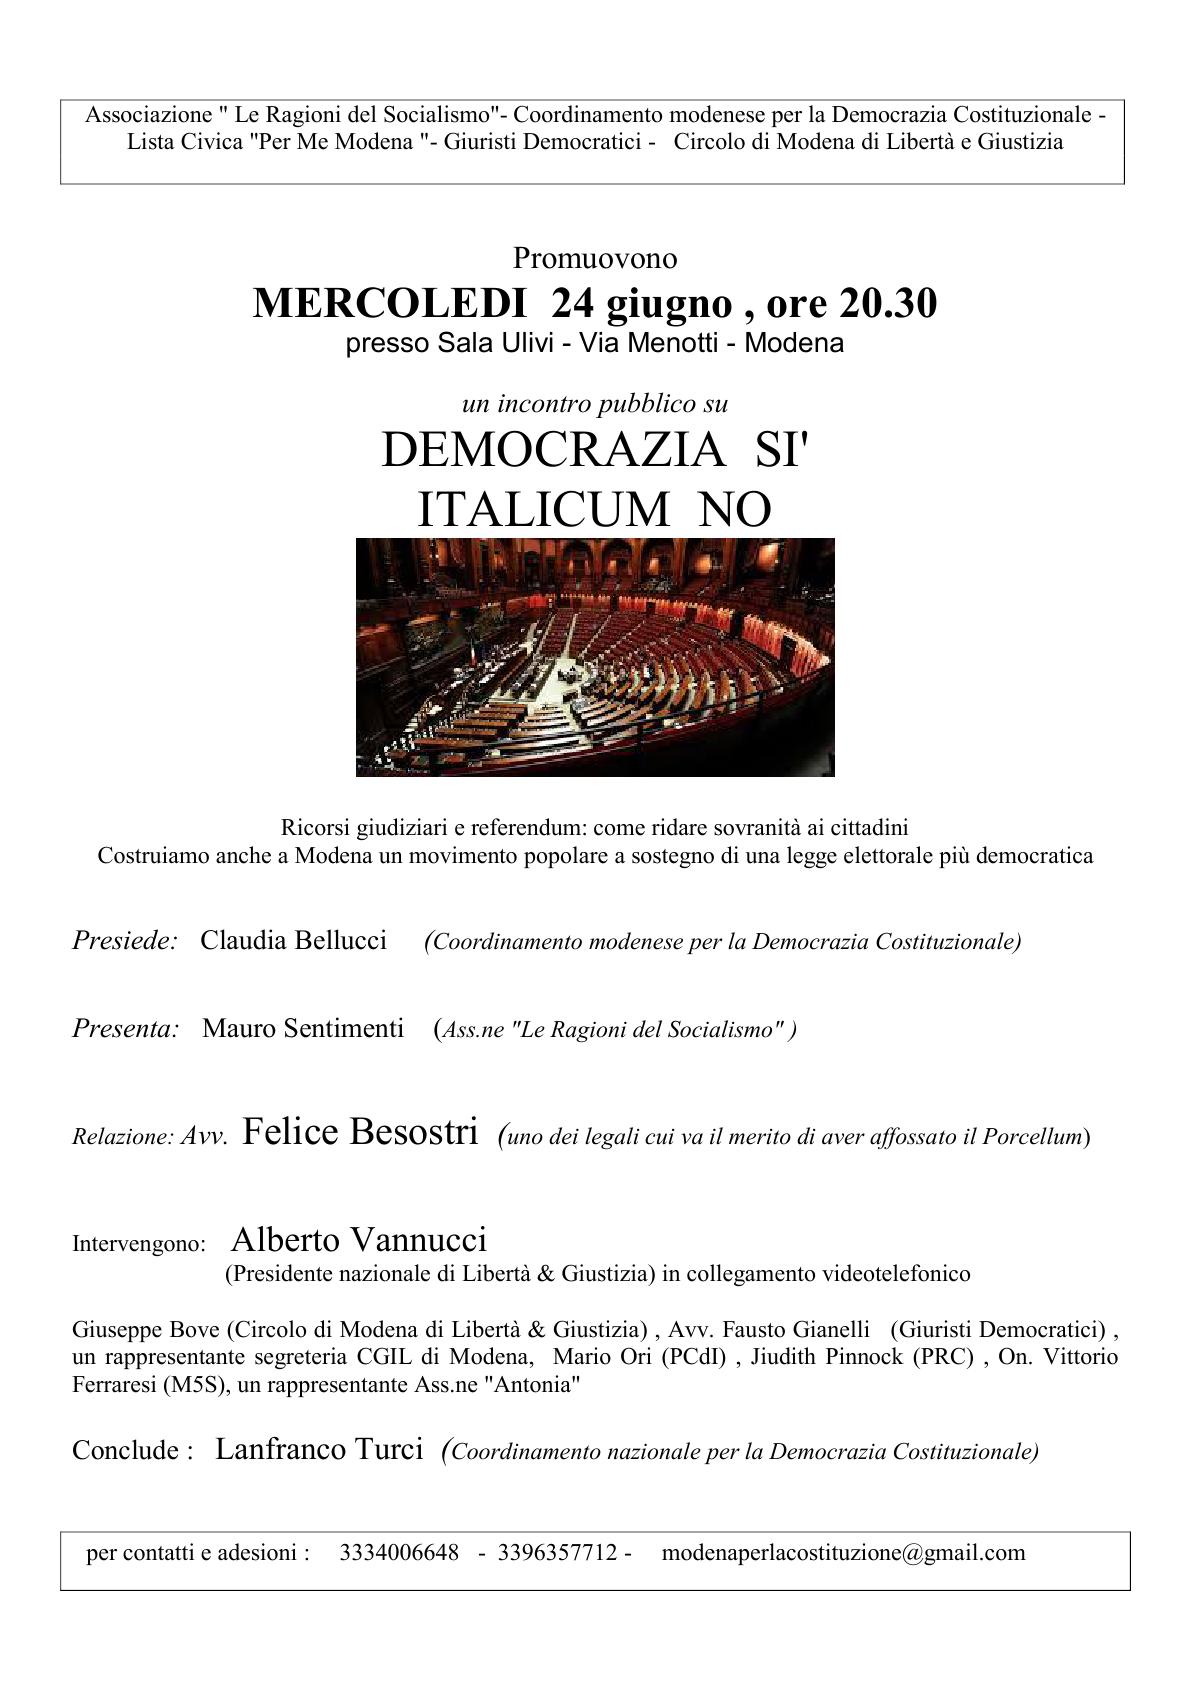 Italicum volantino 24 giugno Modena